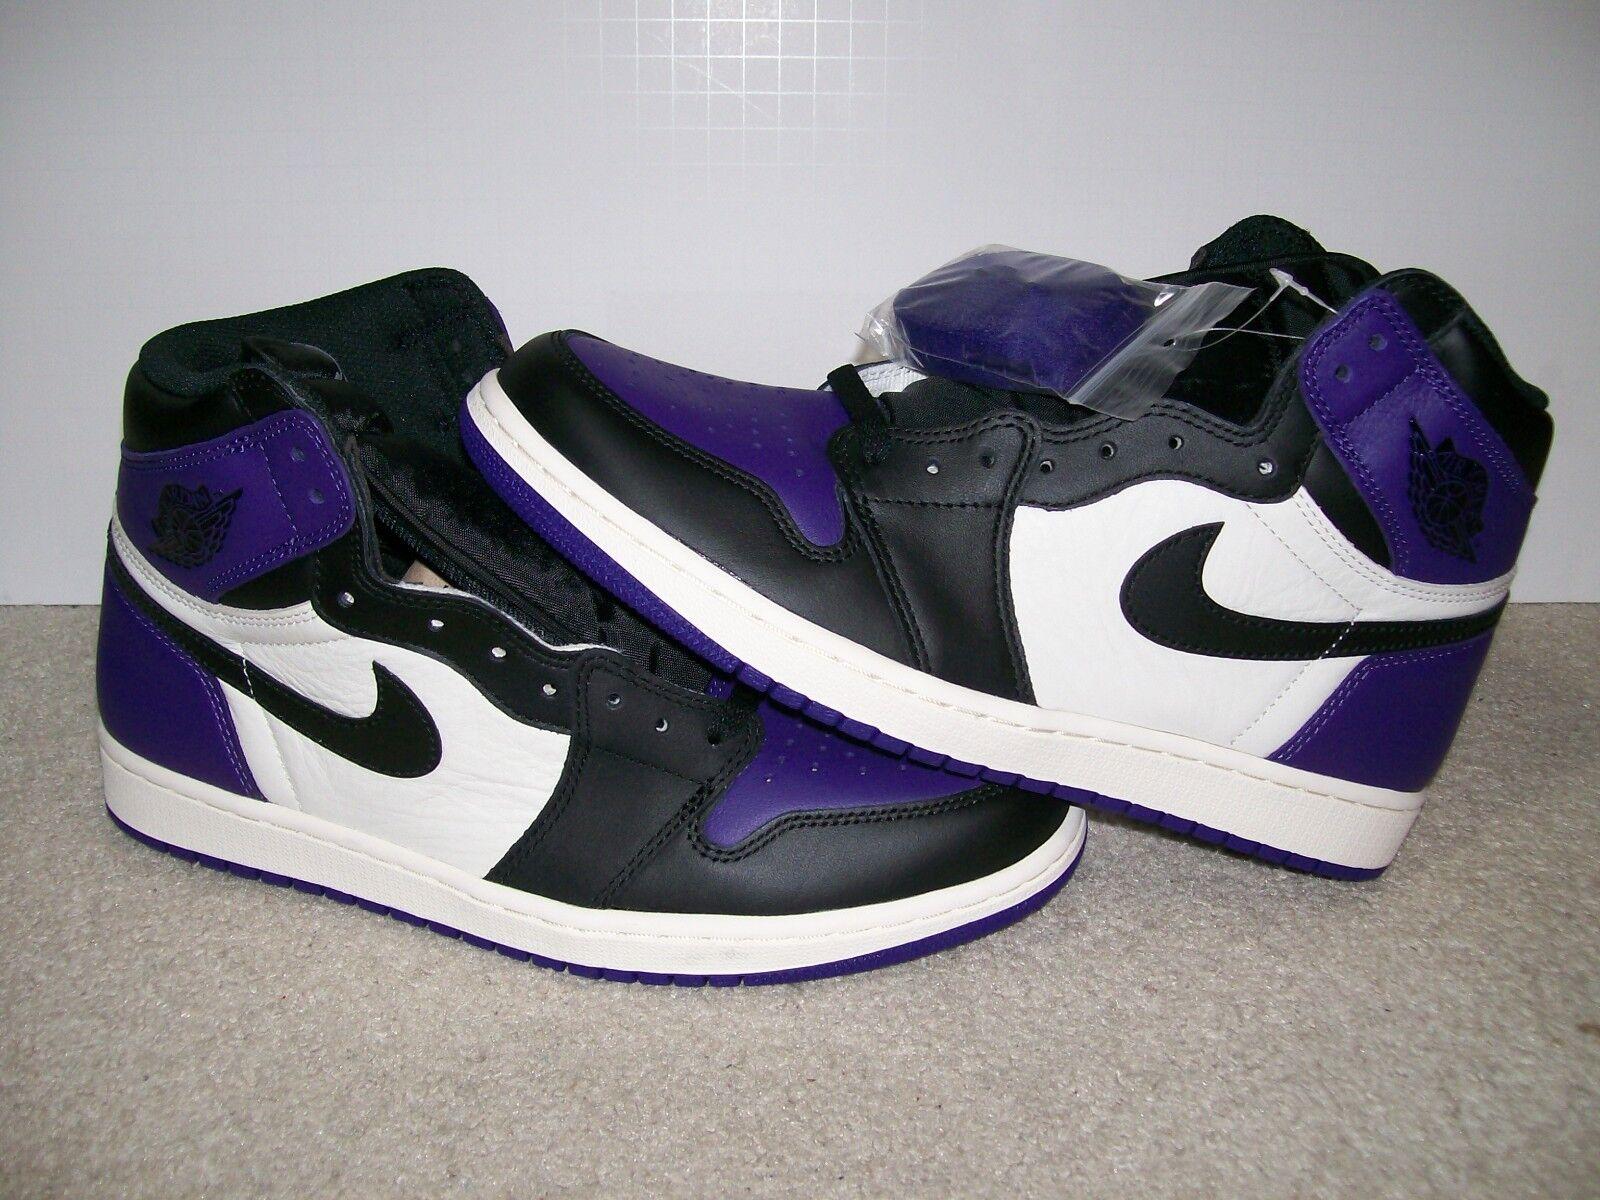 NEW SZ 10.5 Nike Air Jordan 1 High OG Court Purple Royal Bred XI 555088 501 IV V